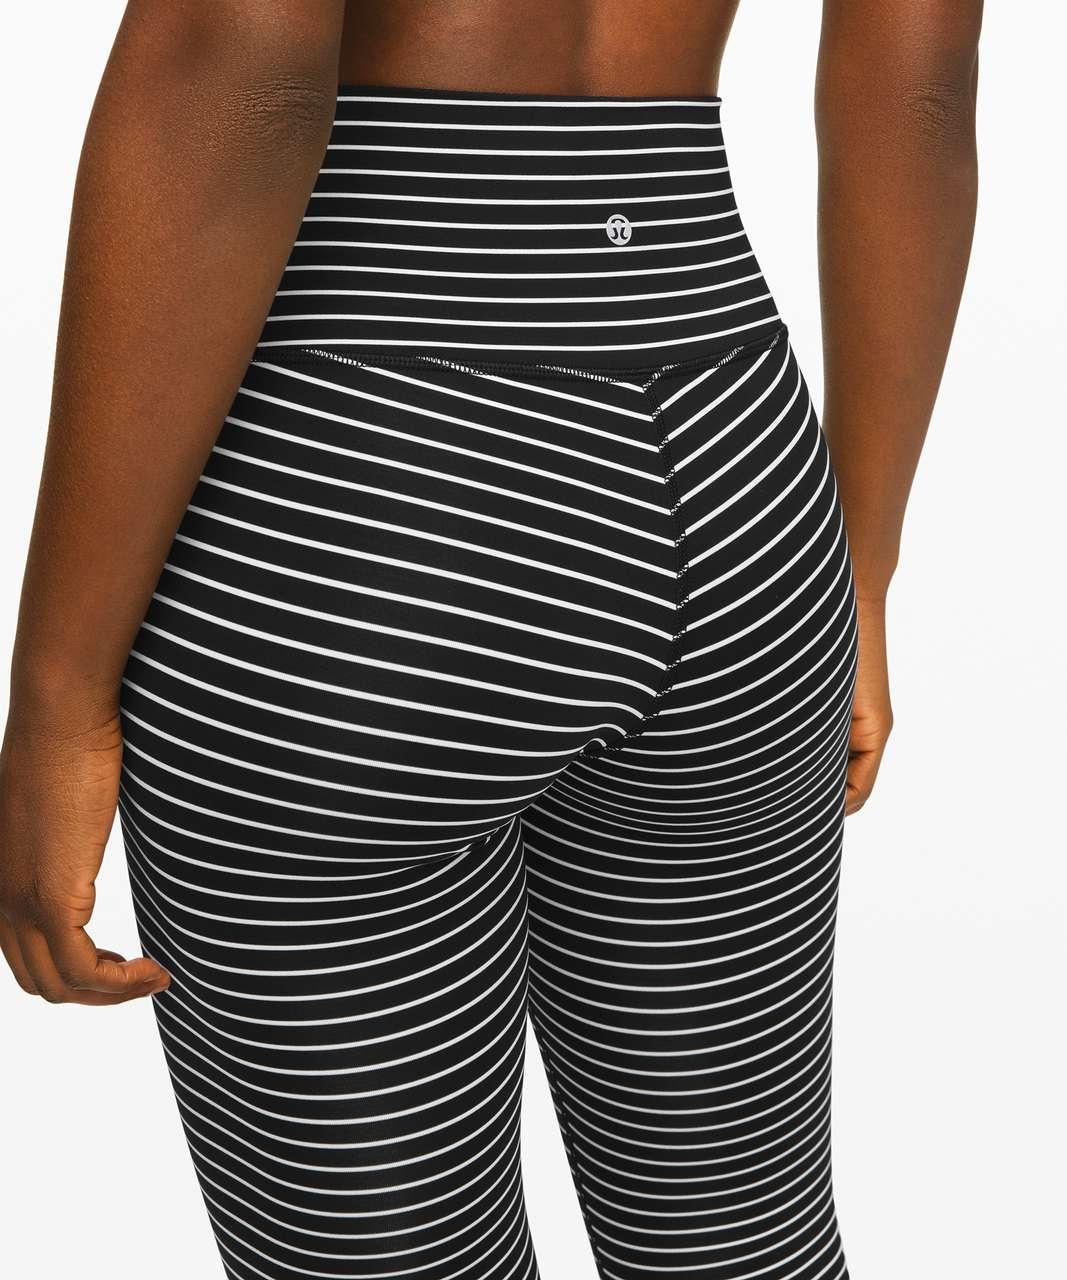 "Lululemon Wunder Under High-Rise Tight 25"" *Luxtreme - Parallel Stripe Black White"